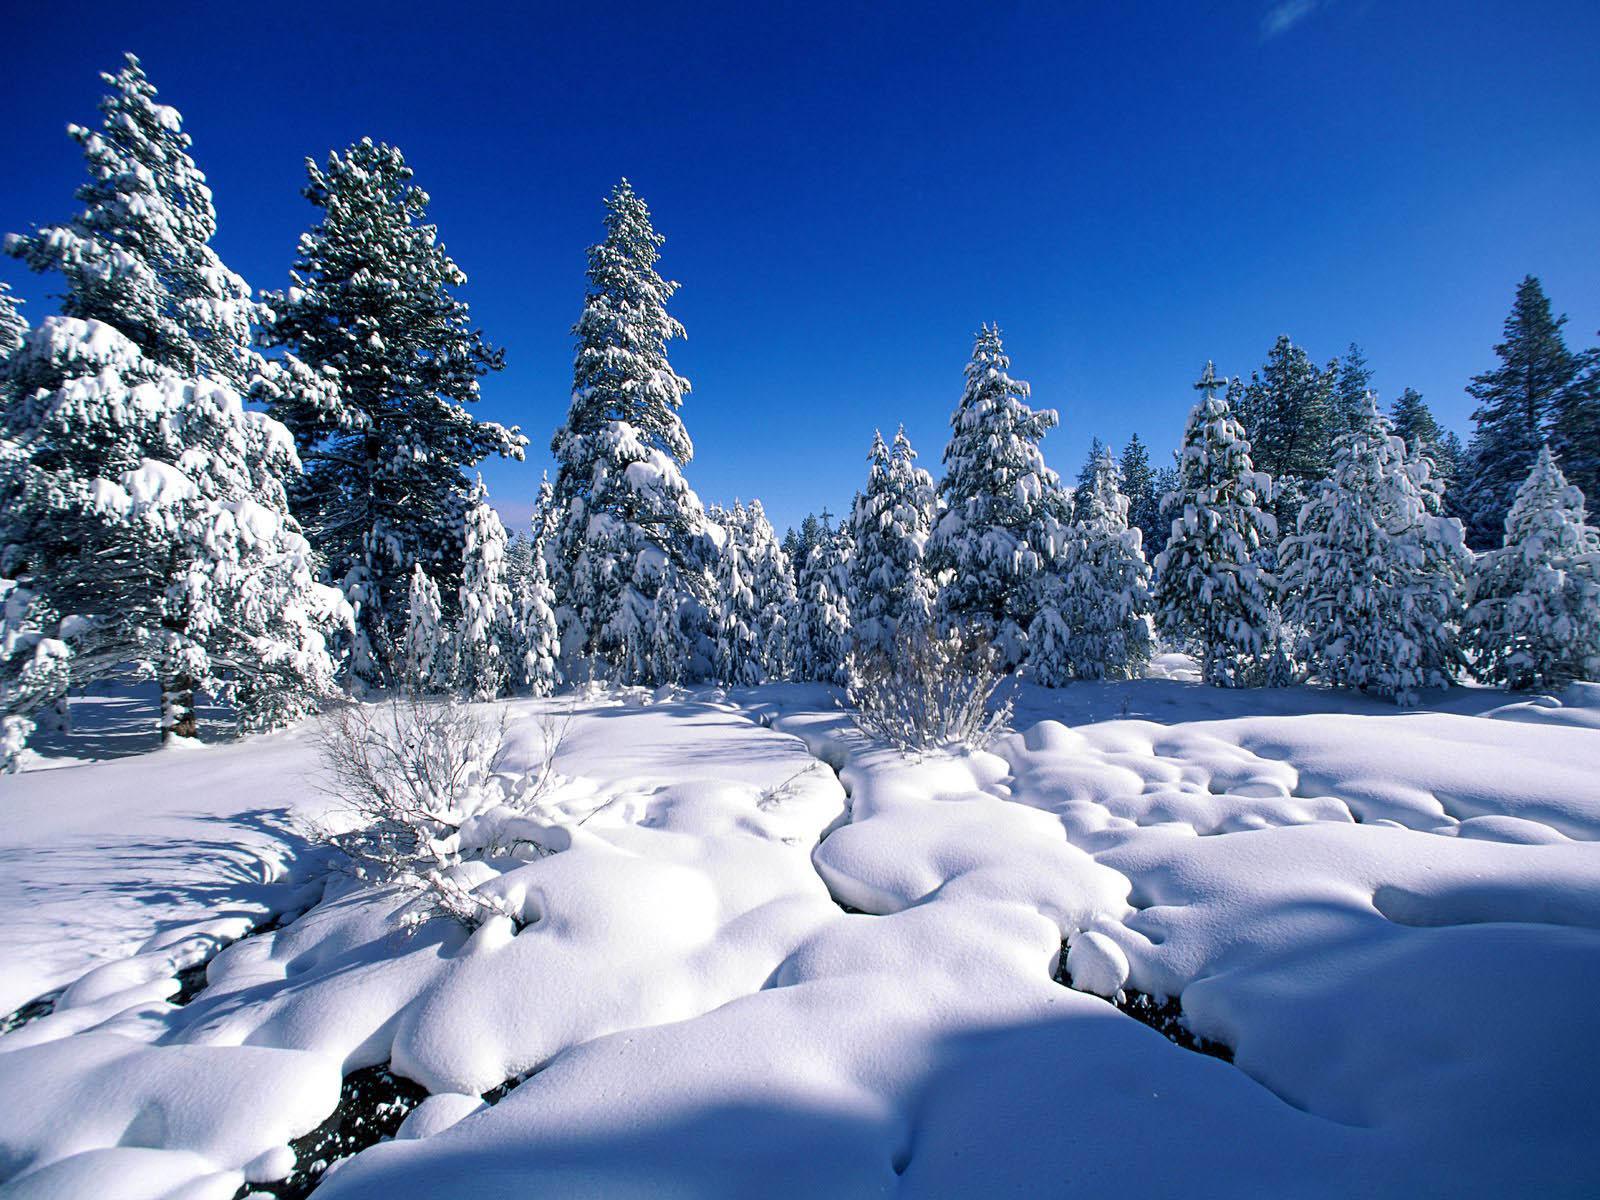 Snow Wallpaper Desktop  HD Wallpapers 4k